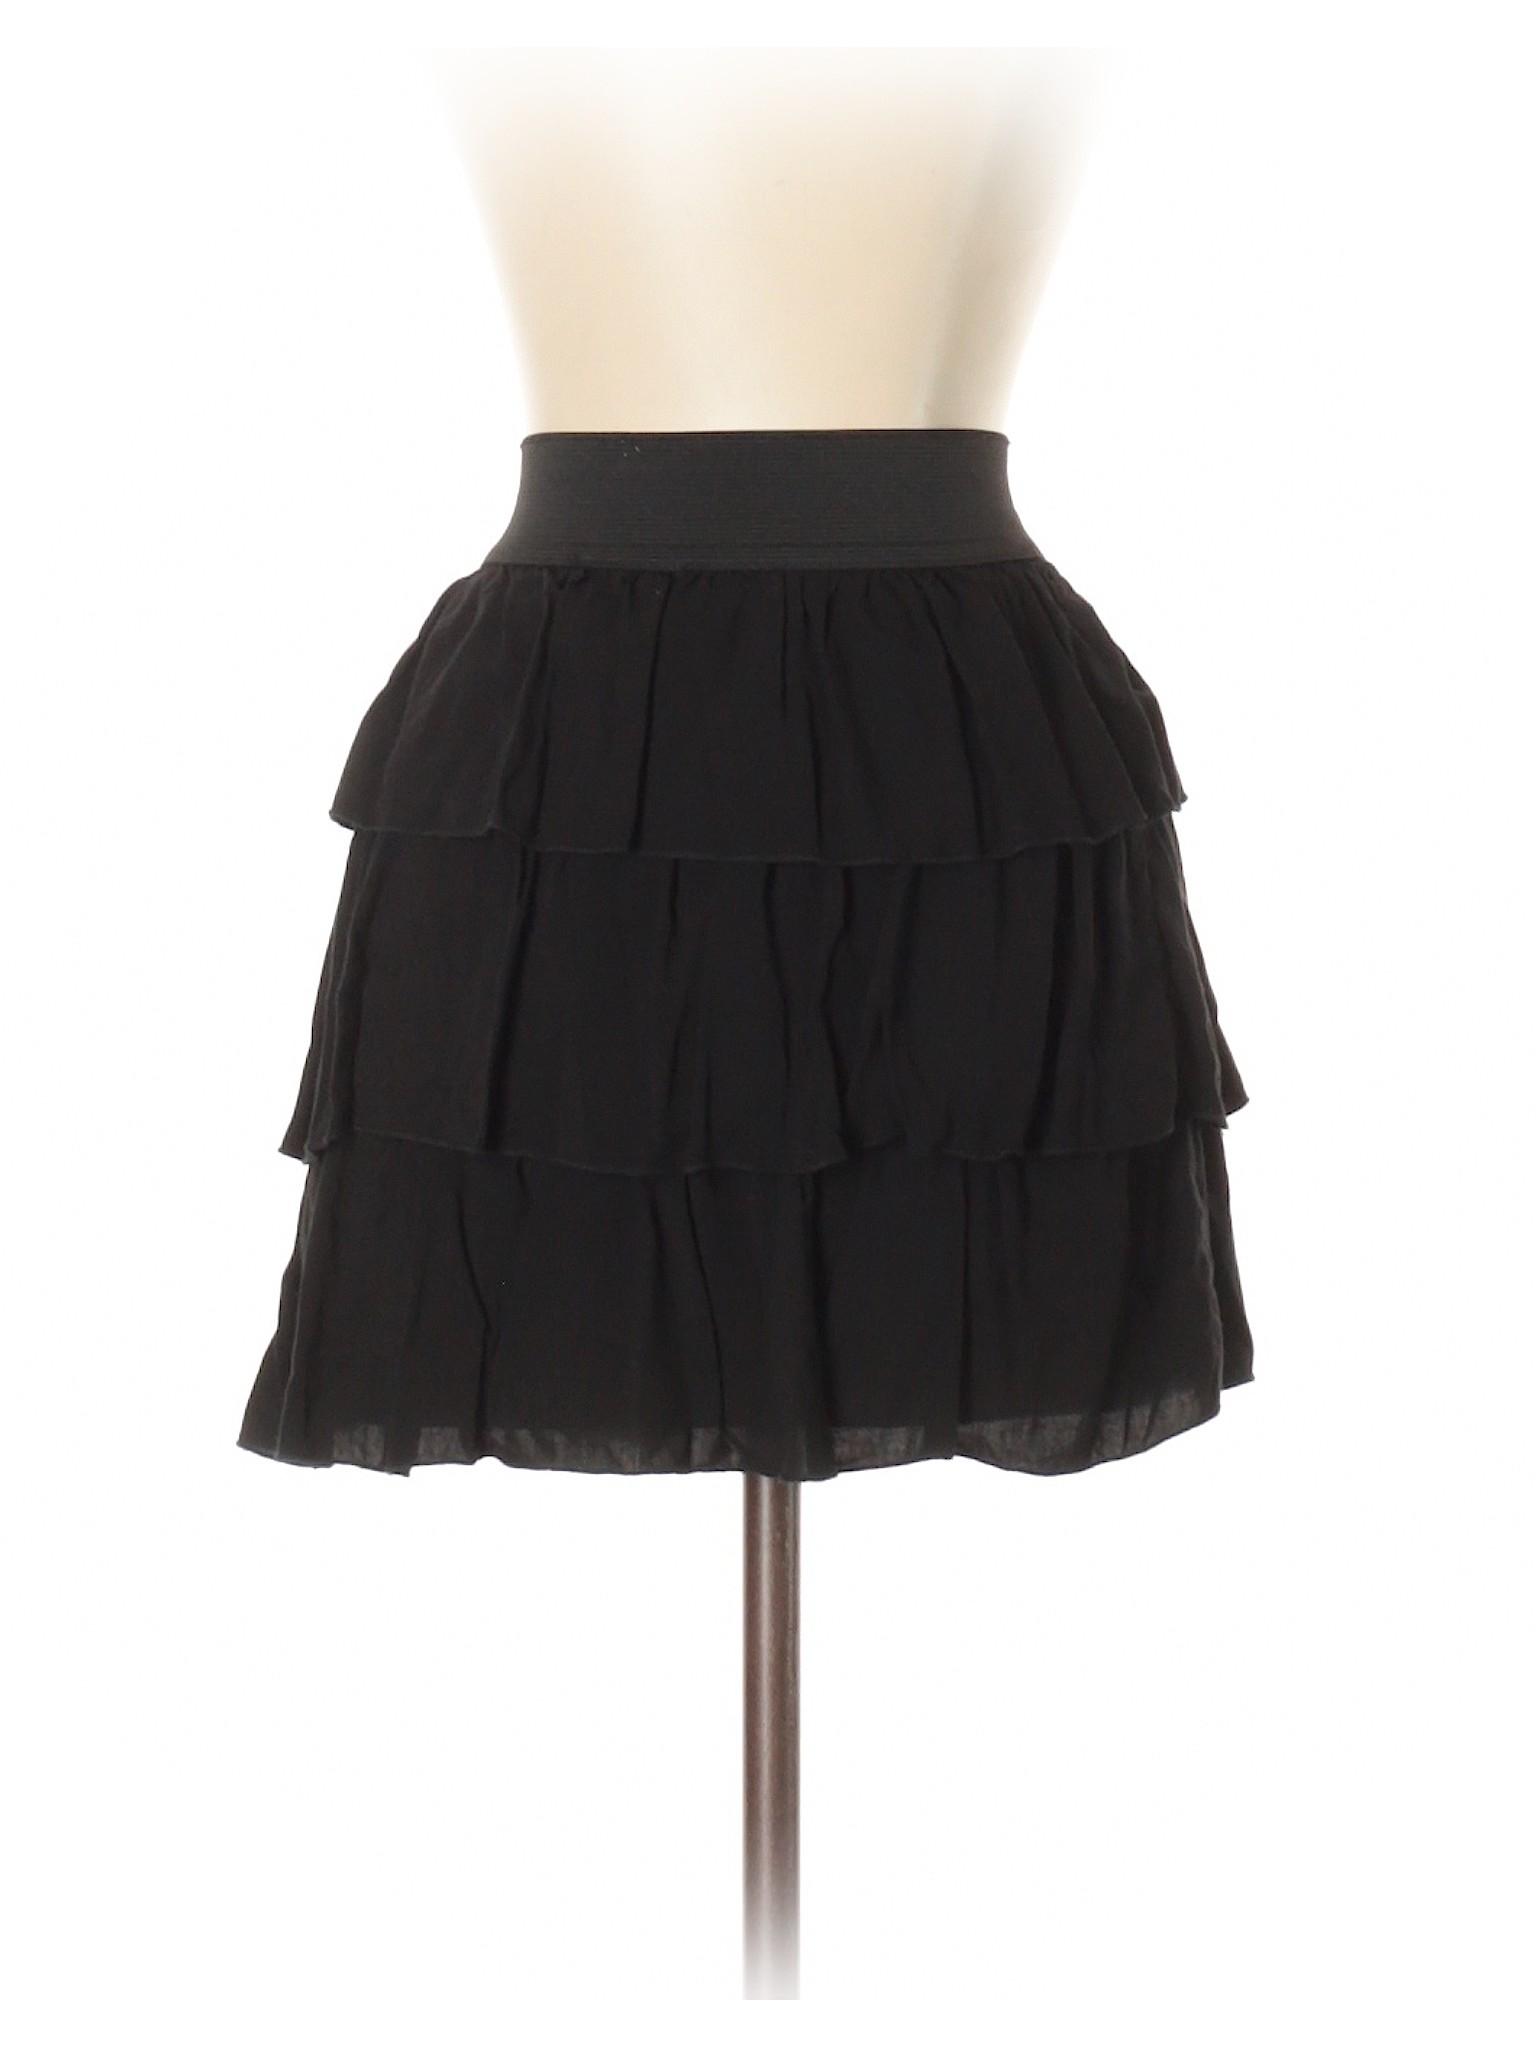 Boutique Skirt Boutique Casual Casual Skirt Boutique wxYwUqtZ